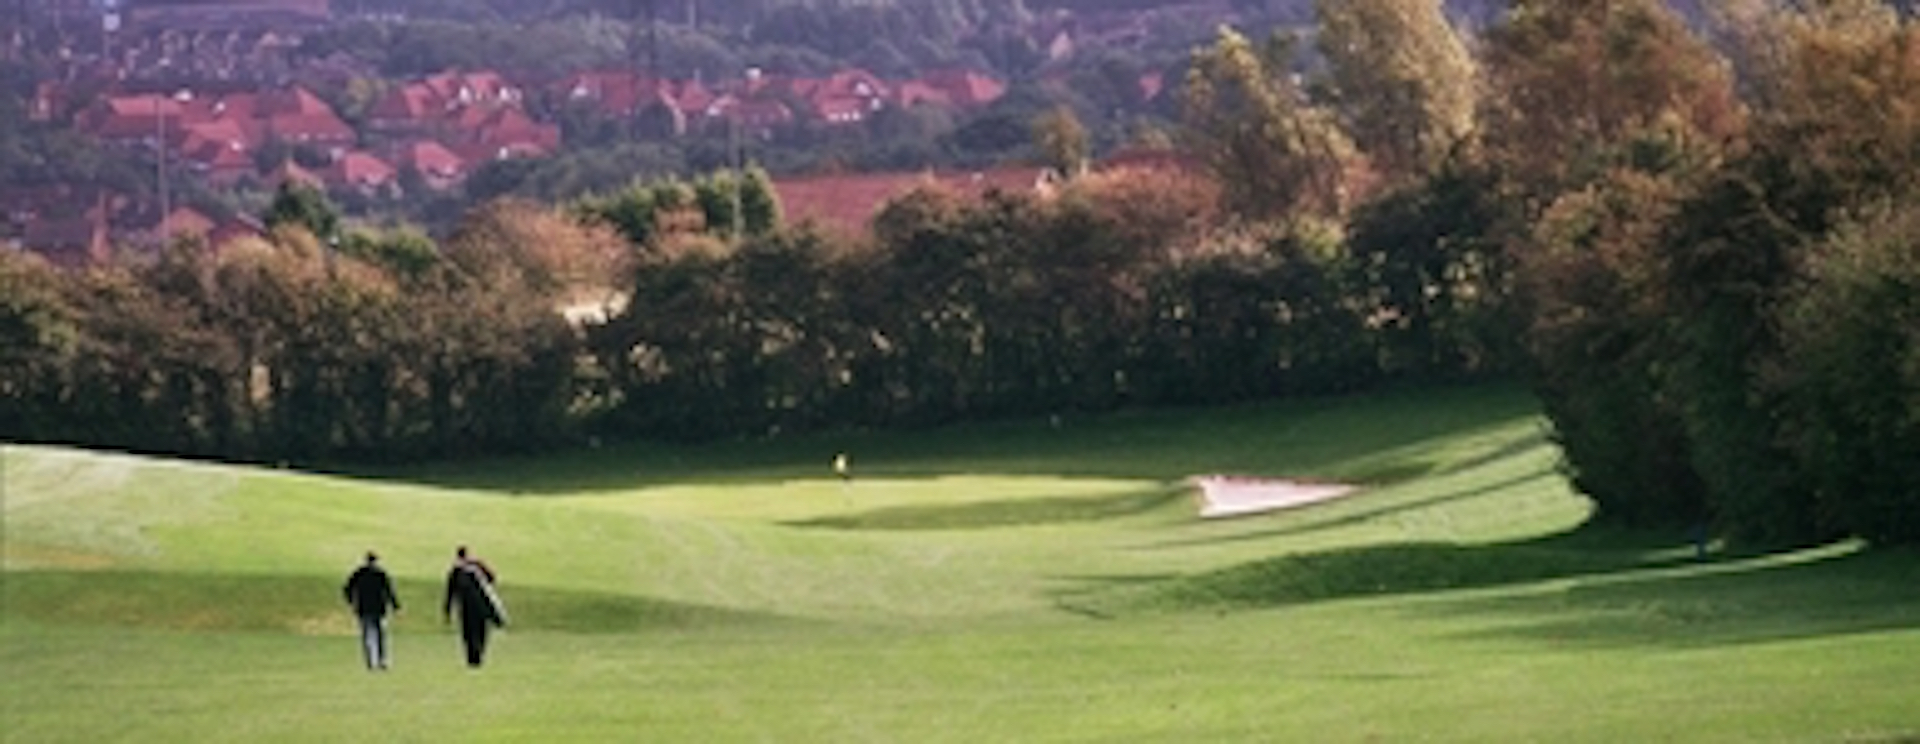 Danny Willett learnt golf on a municipal